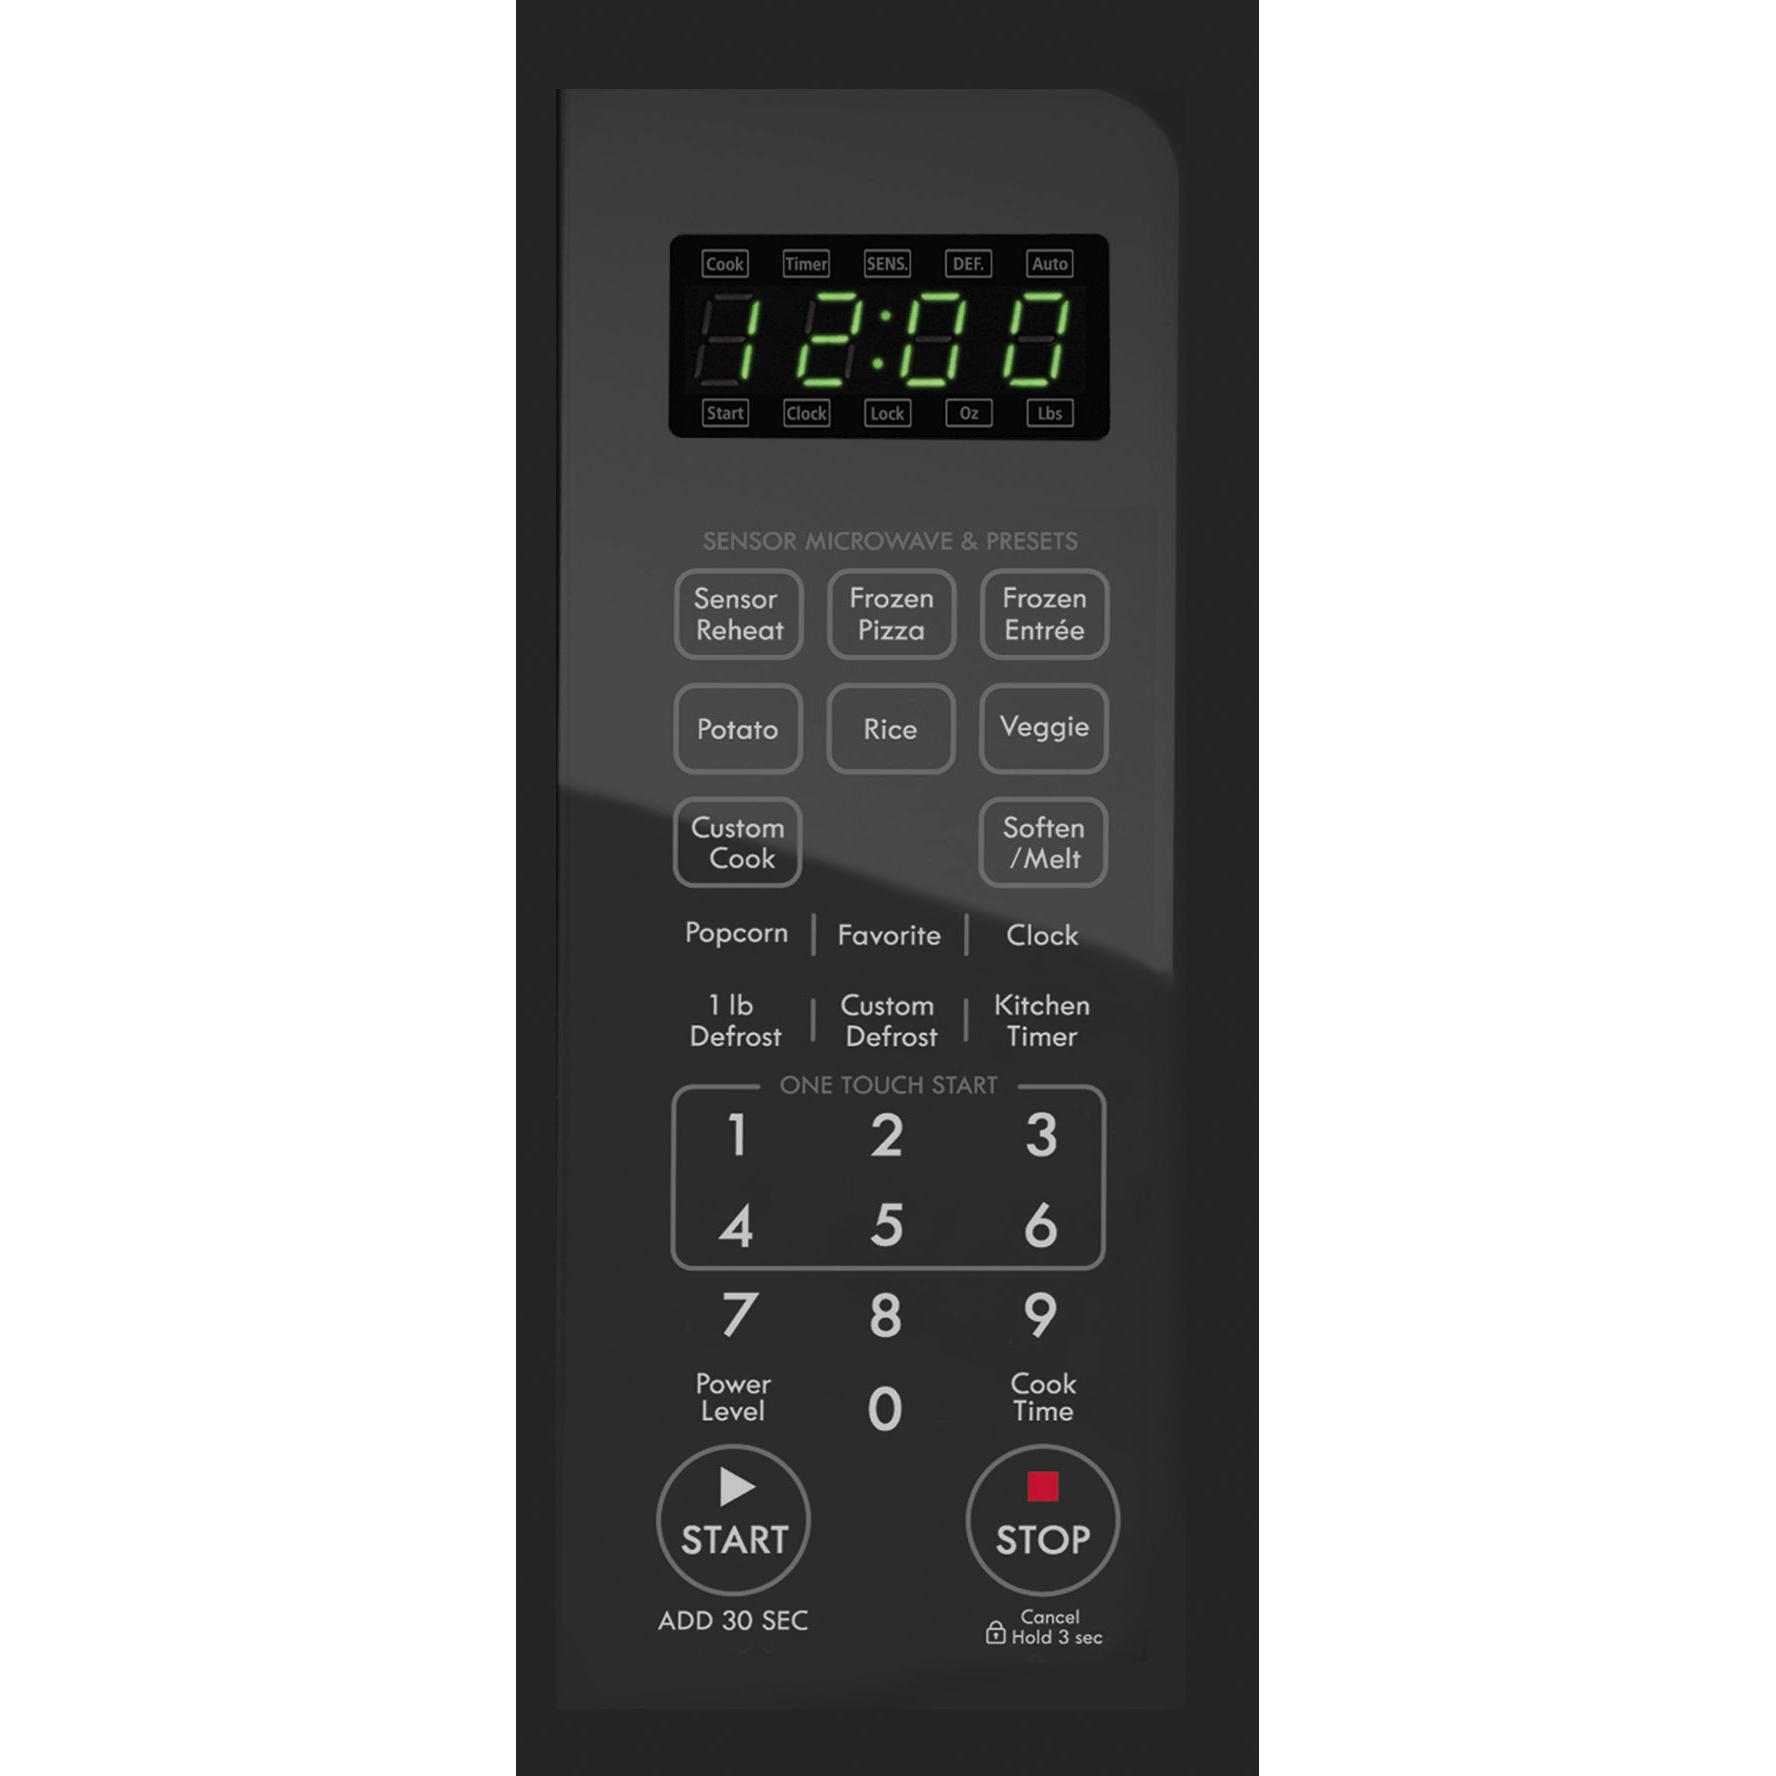 Kenmore 72123 1.2  cu. ft. Countertop Microwave w/ EZ Clean Interior - Stainless Steel